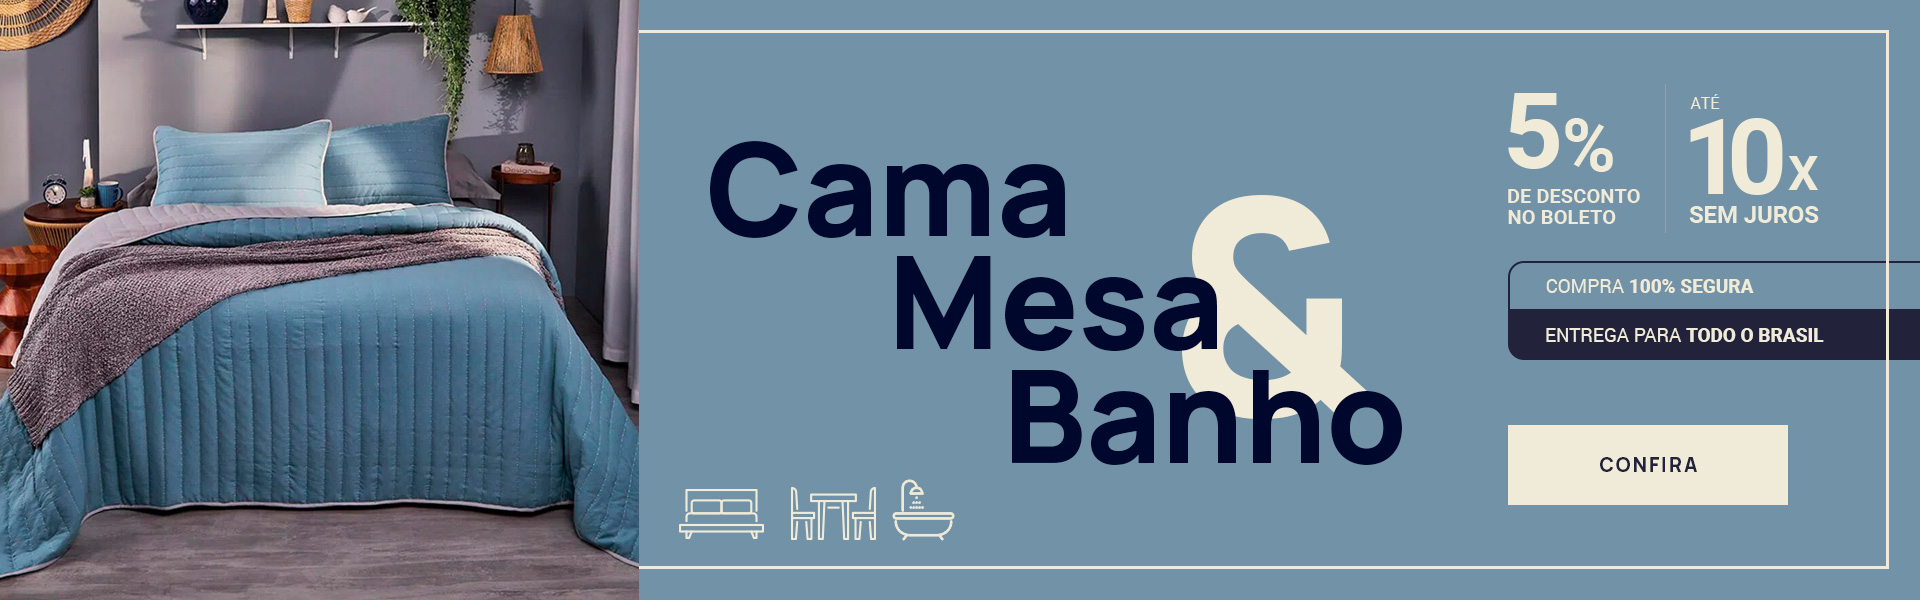 Banner - Cama, Mesa e Banho